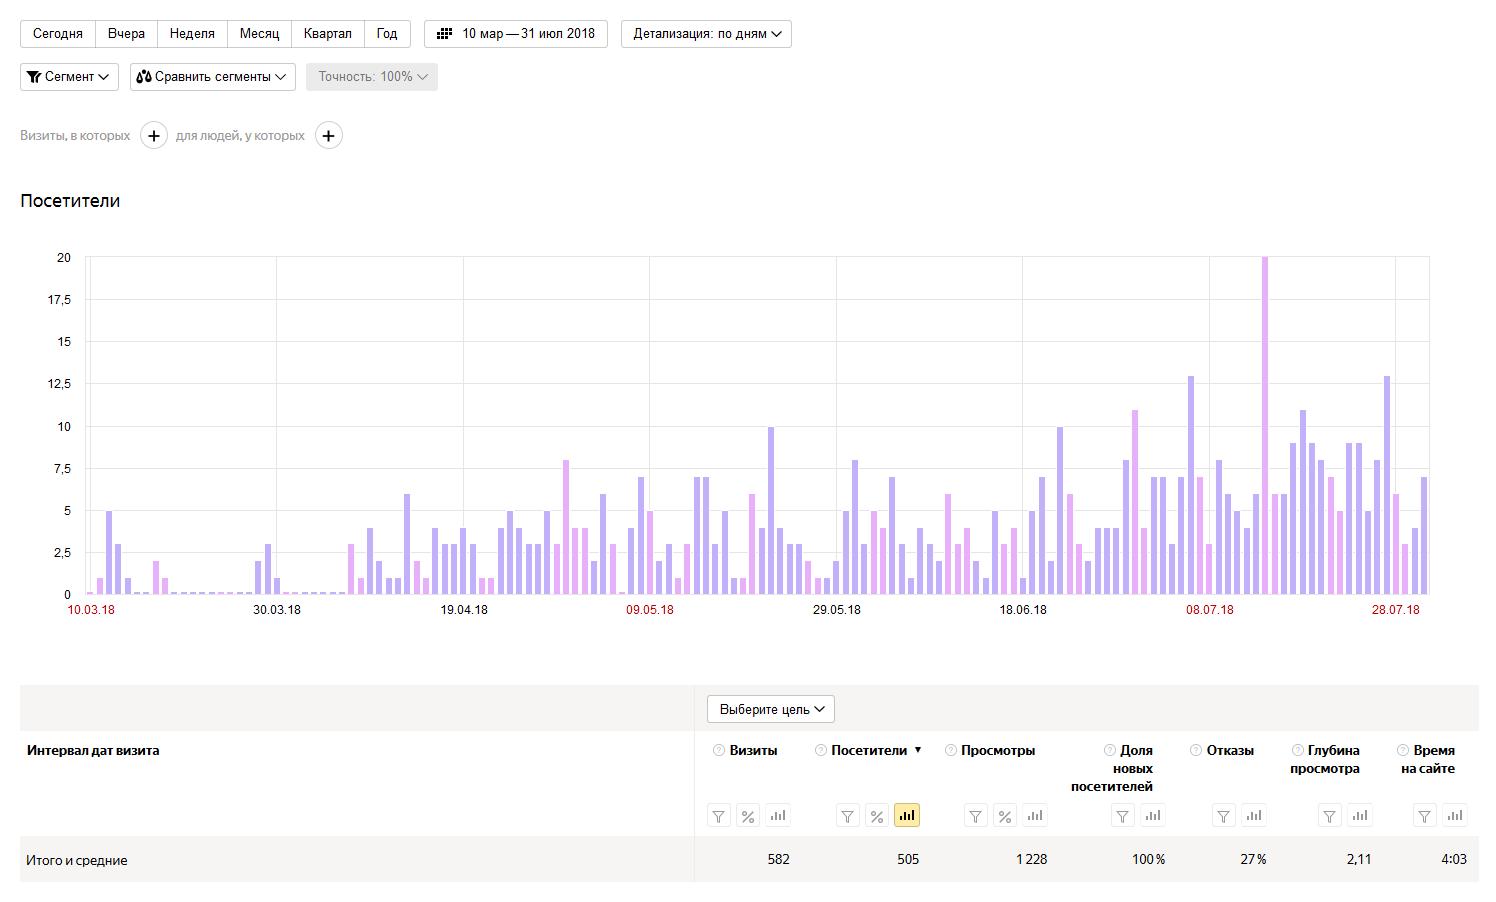 Проект #4 (Бурж хобби), 4,5 месяцев – 166 материалов